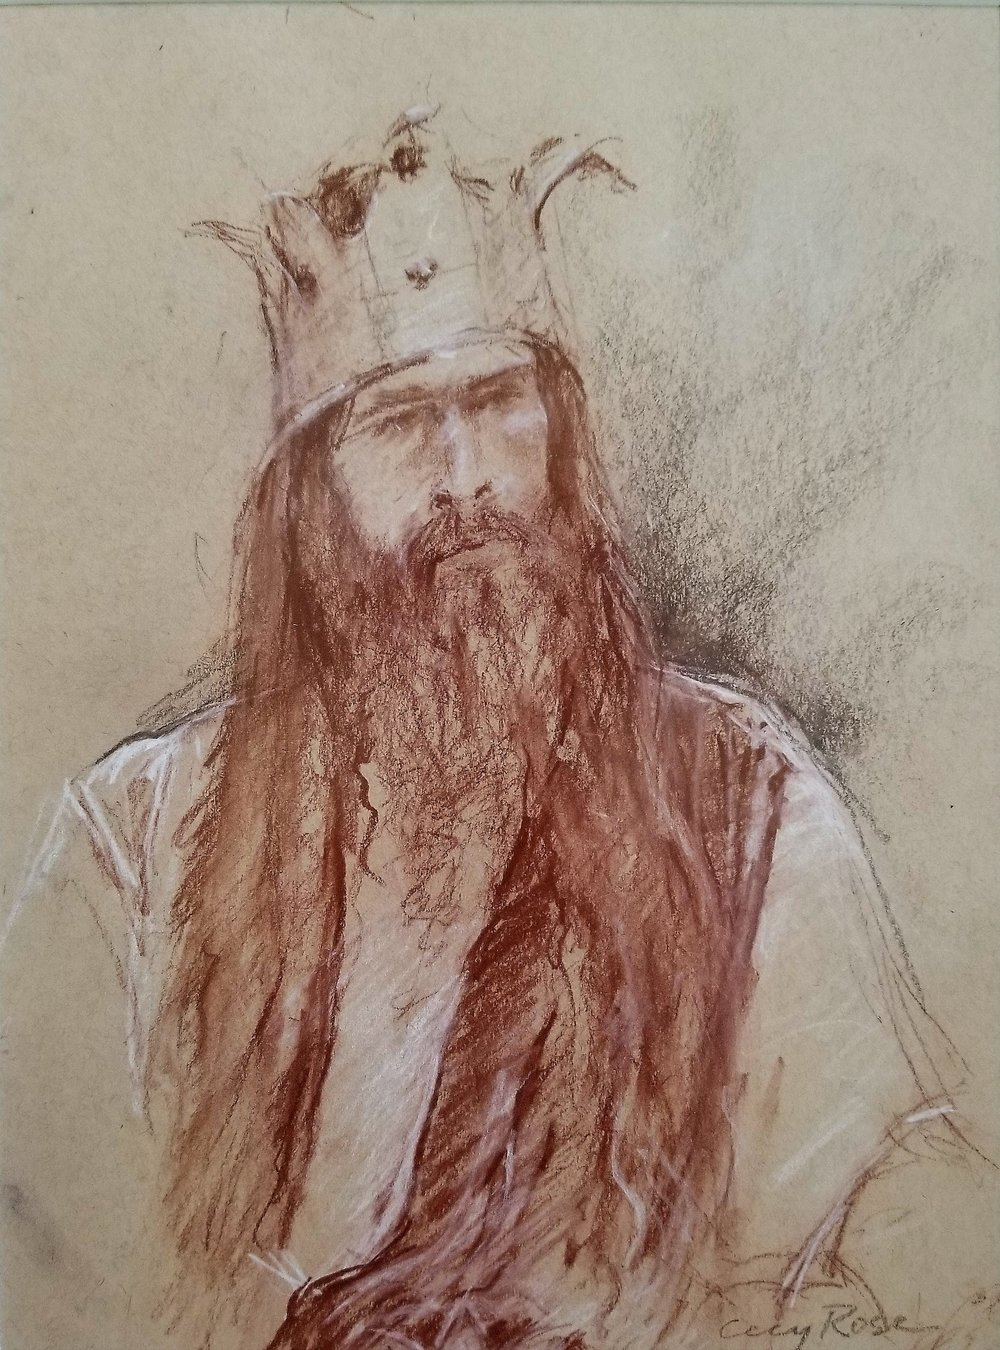 King Courtney